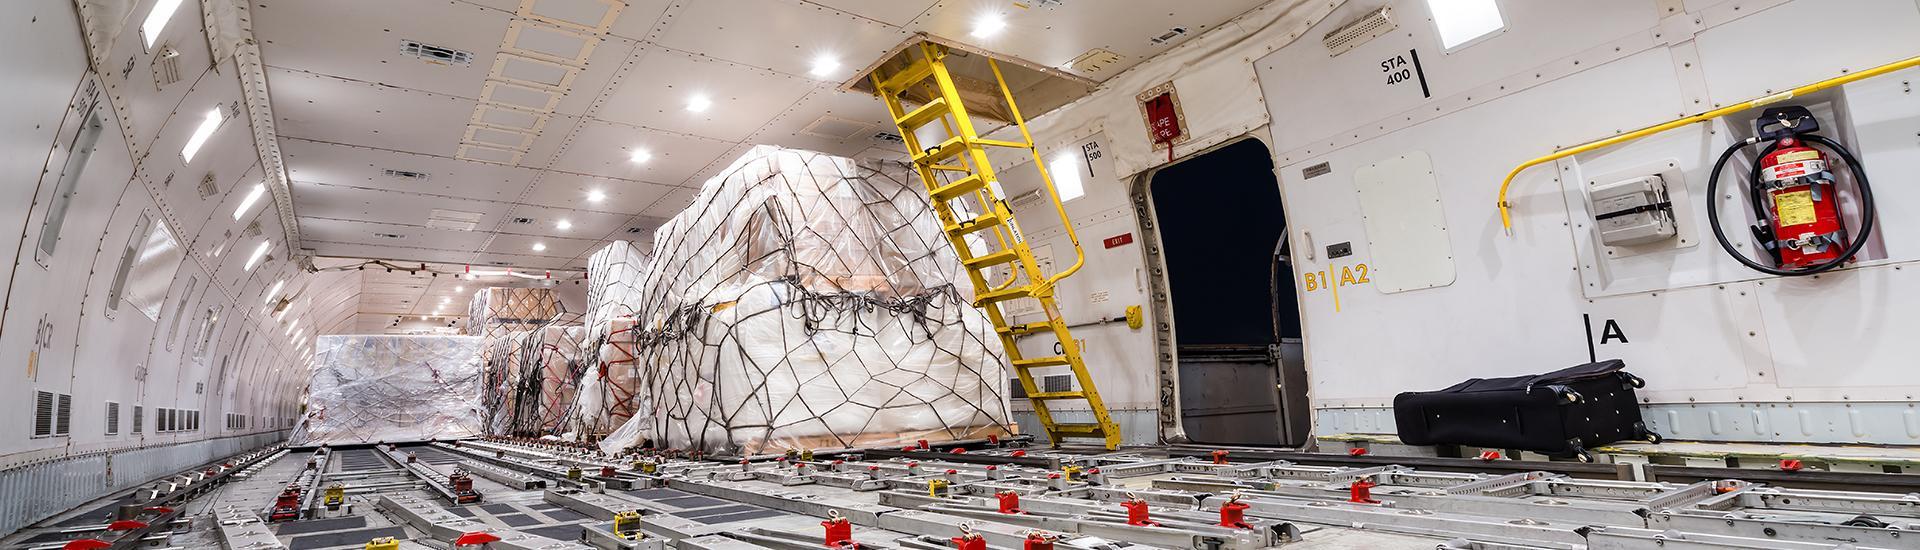 Air transport air freight express transport AHA Logistics